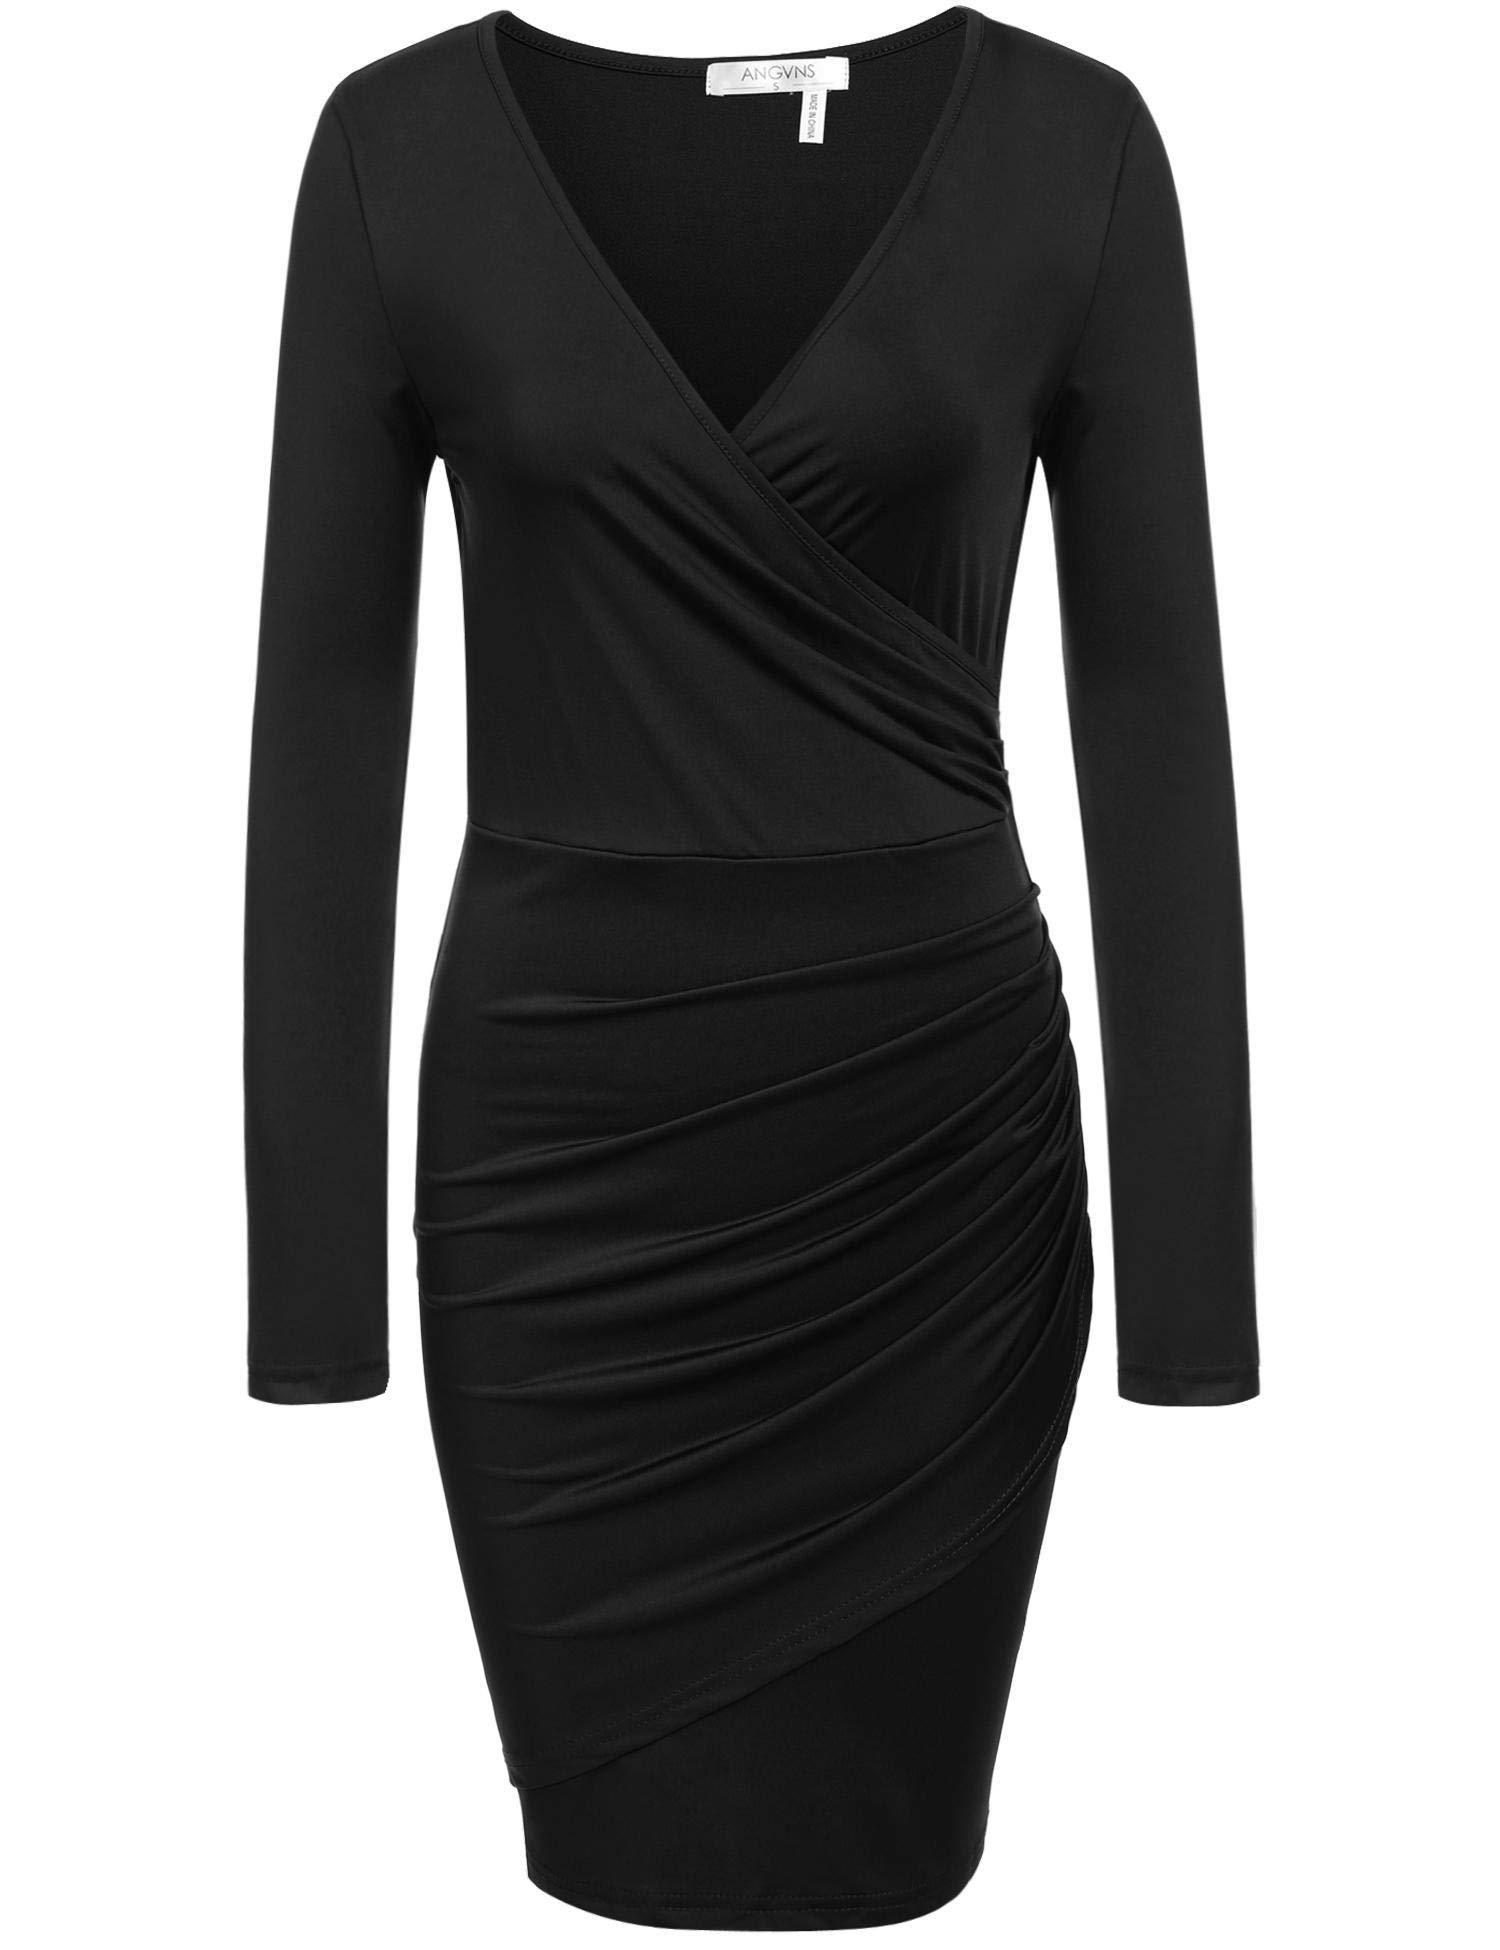 ANGVNS Women Long Sleeve V Neck Slimming Office Pencil Dress, Black, M